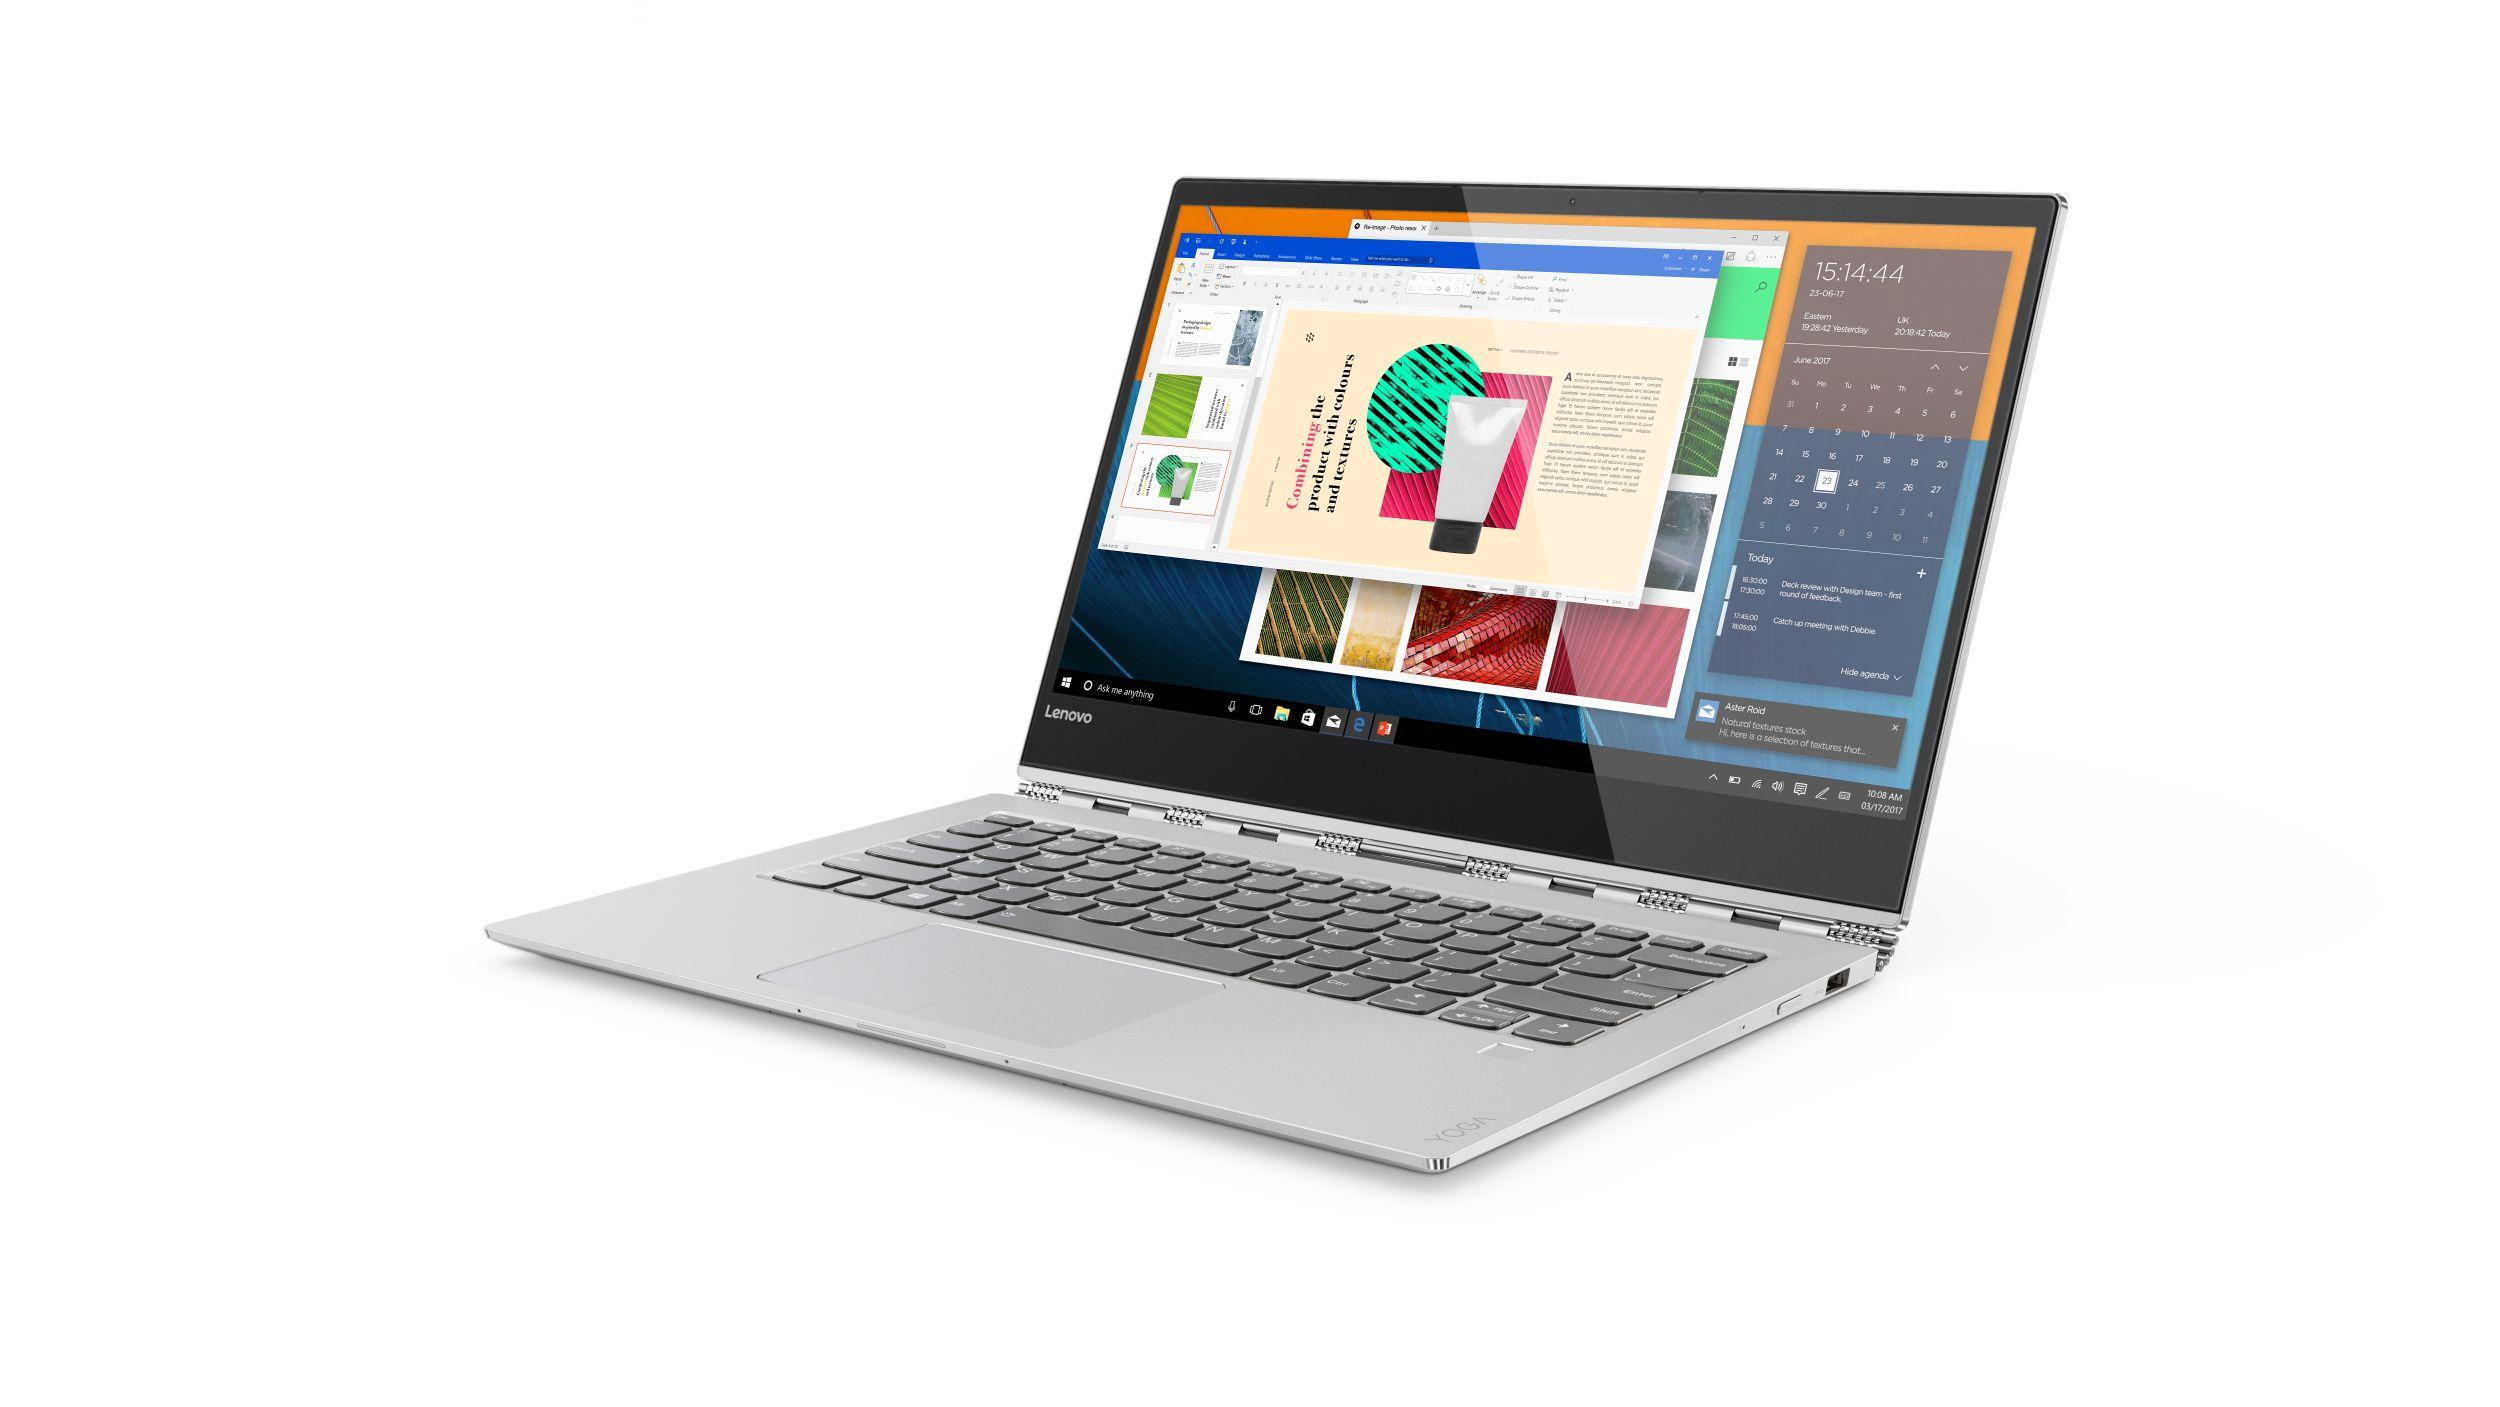 "Lenovo YOGA 920-13IKB i5-8250U 3,40GHz/8GB/SSD 256GB/13,9"" FHD/IPS/multitouch/ActivePen/WIN10 stříbrná 80Y7001YCK"